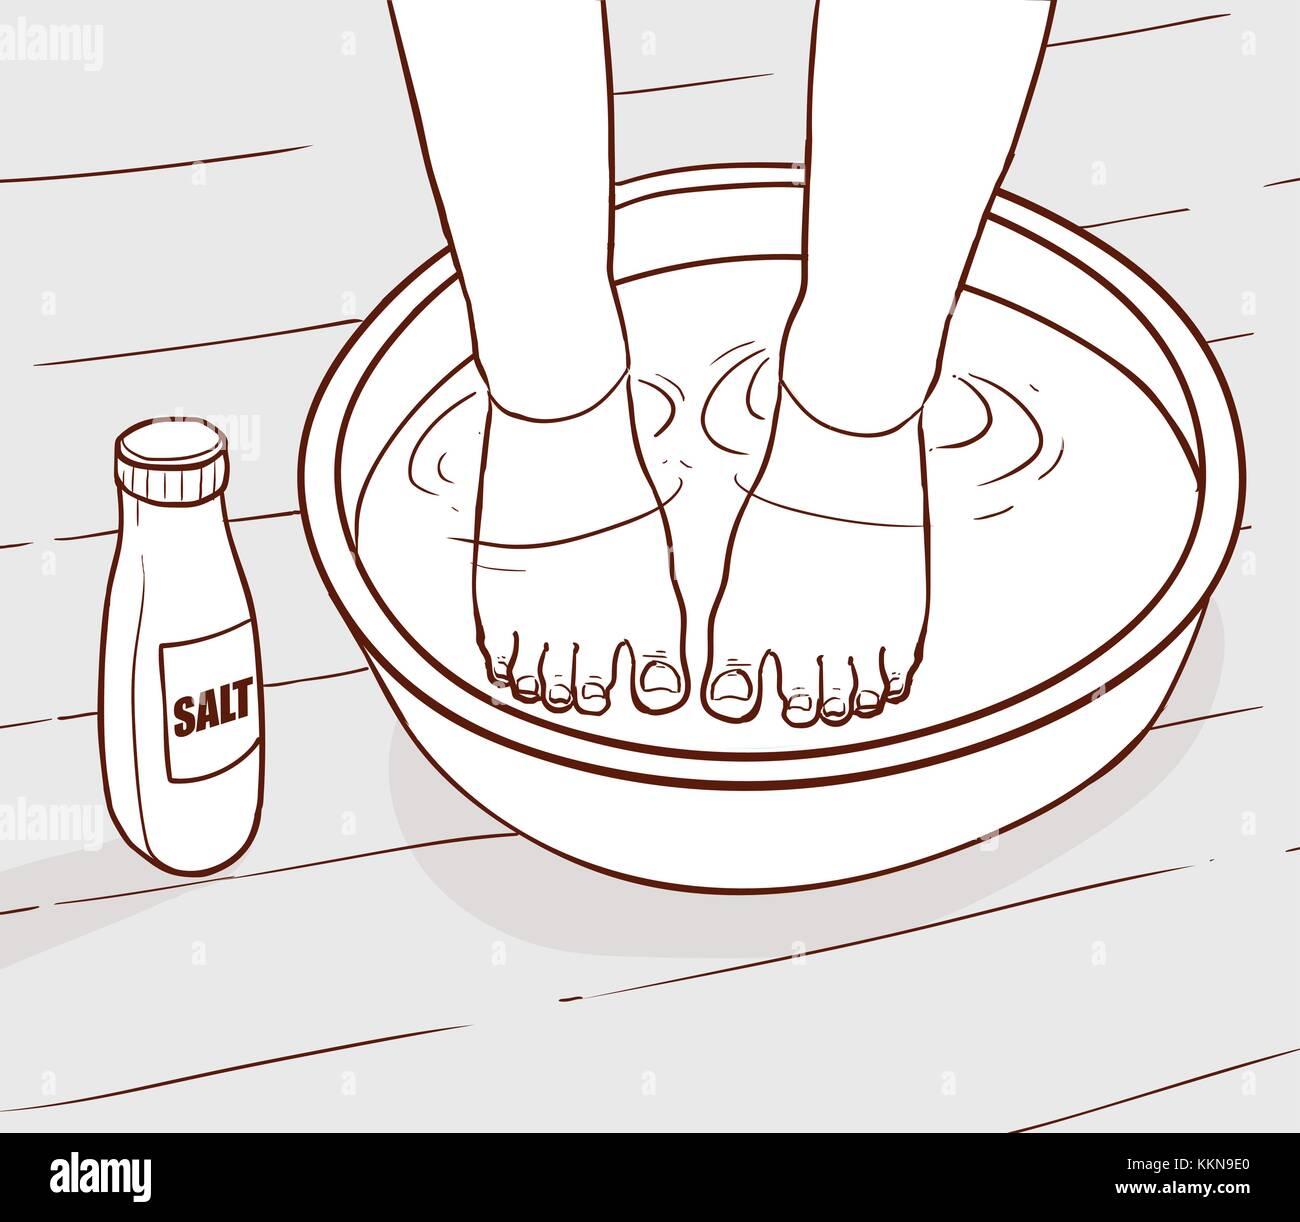 Illustration Of Salt Water Treatment On The Feet Stock Vector Art Diagram